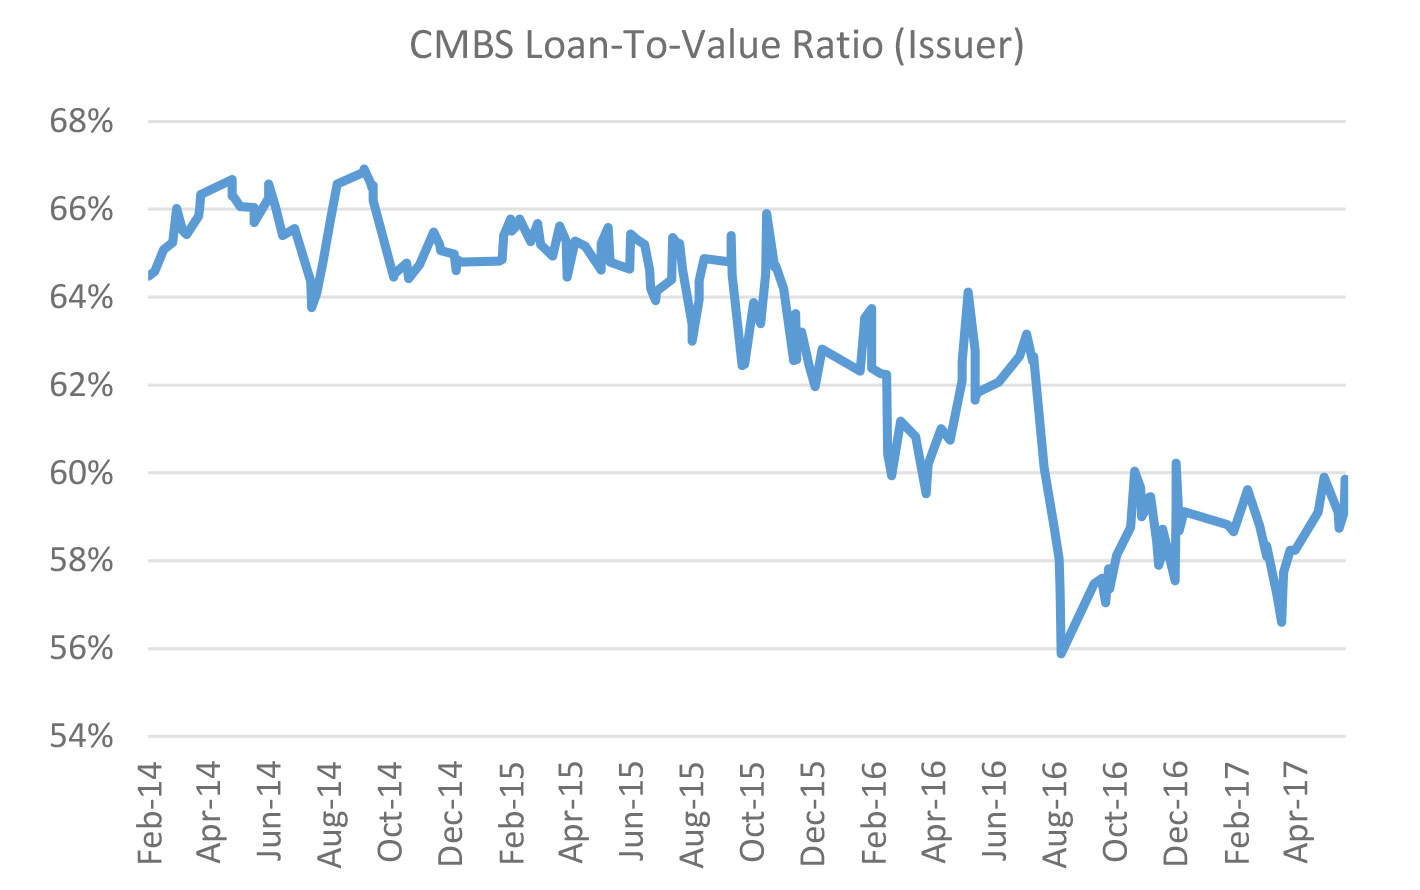 Sources: Commercial Mortgage Alert, Yardi Matrix